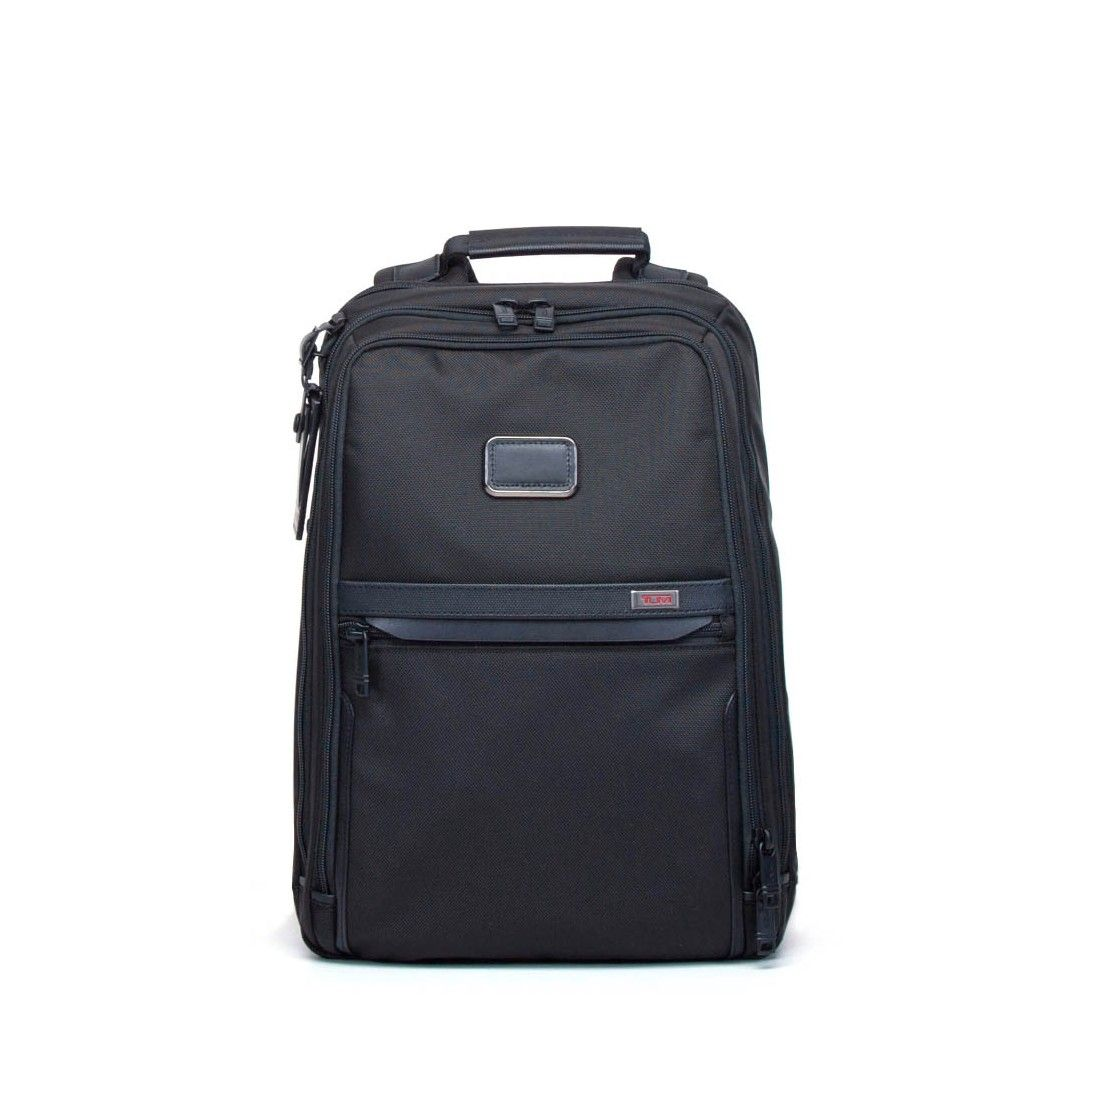 Mochila Slim Backpack - Tumi - 1